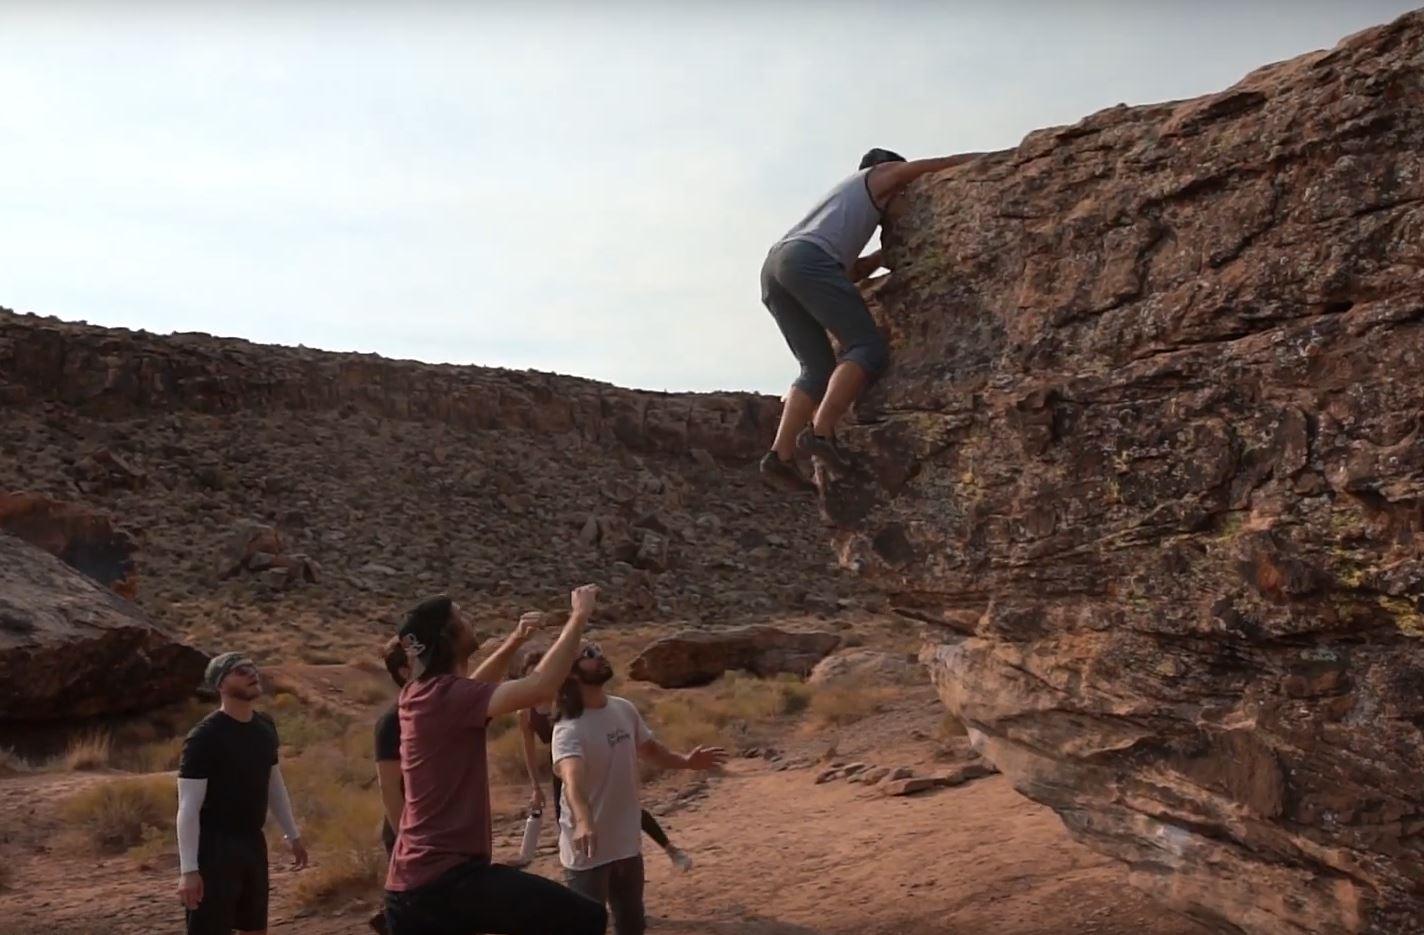 Moe's Valley Rock Climbing